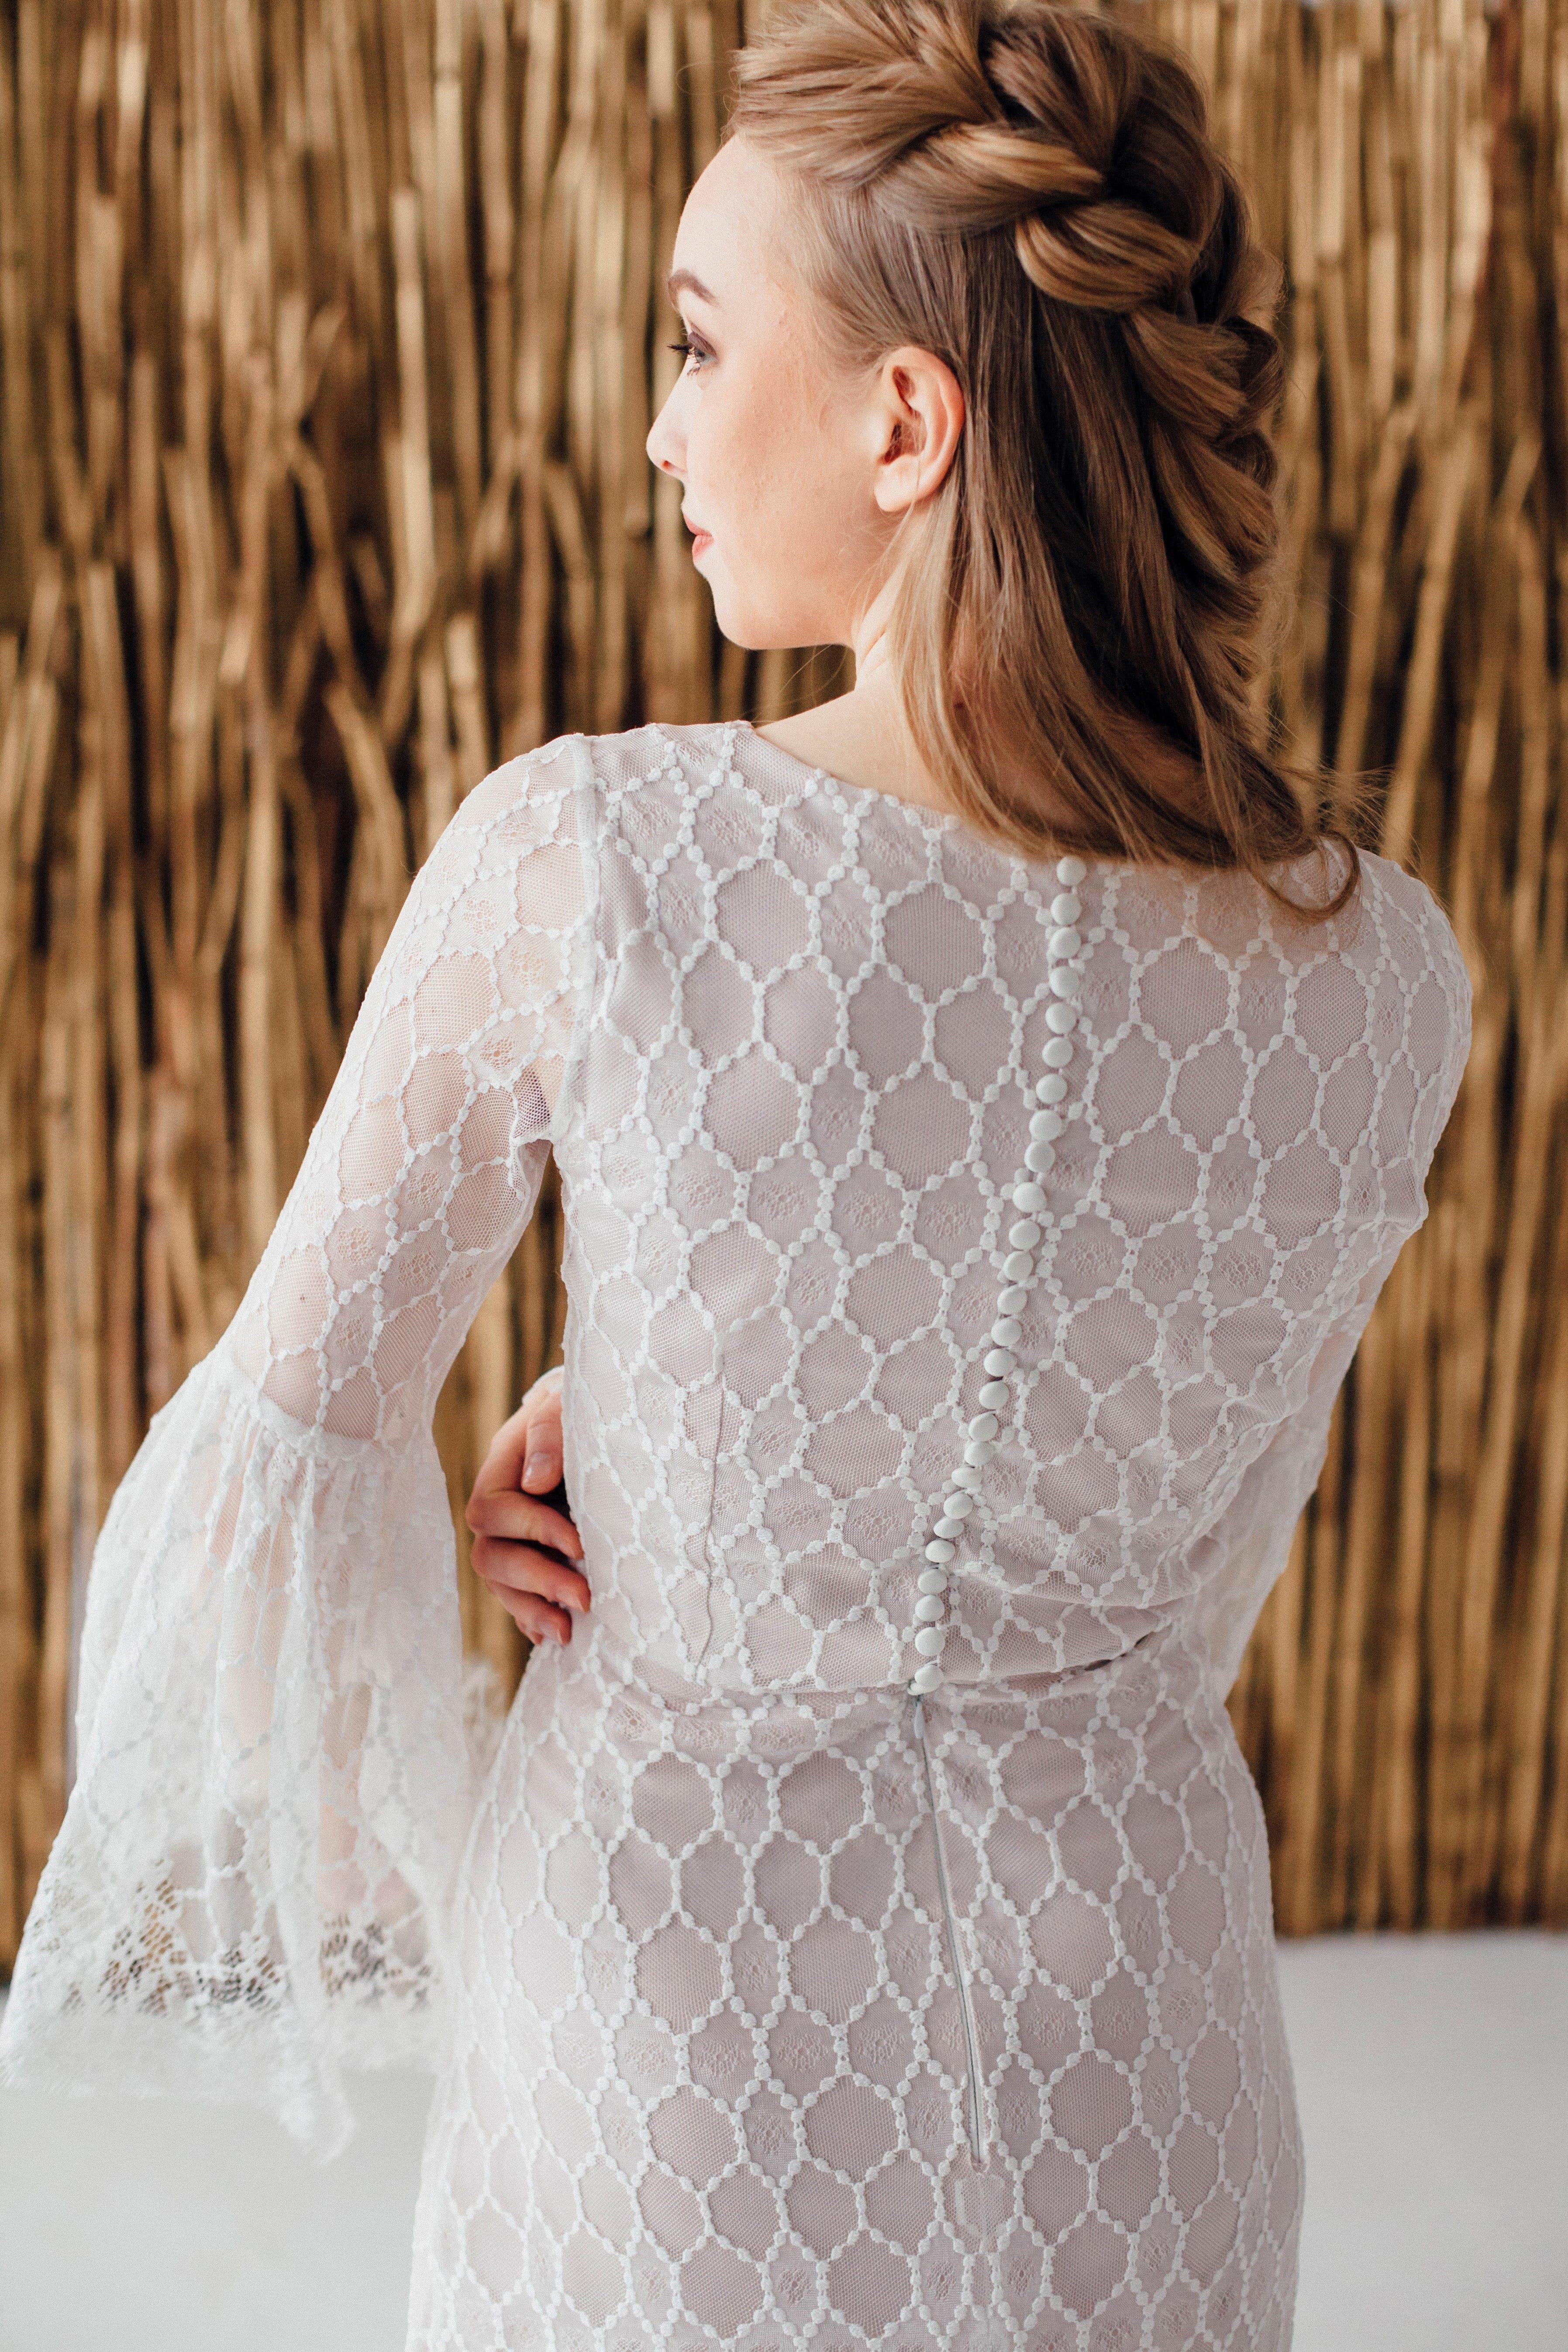 Свадебное платье EDISON, коллекция MAGIC OF TENDERNESS, бренд LORA SONG, фото 3